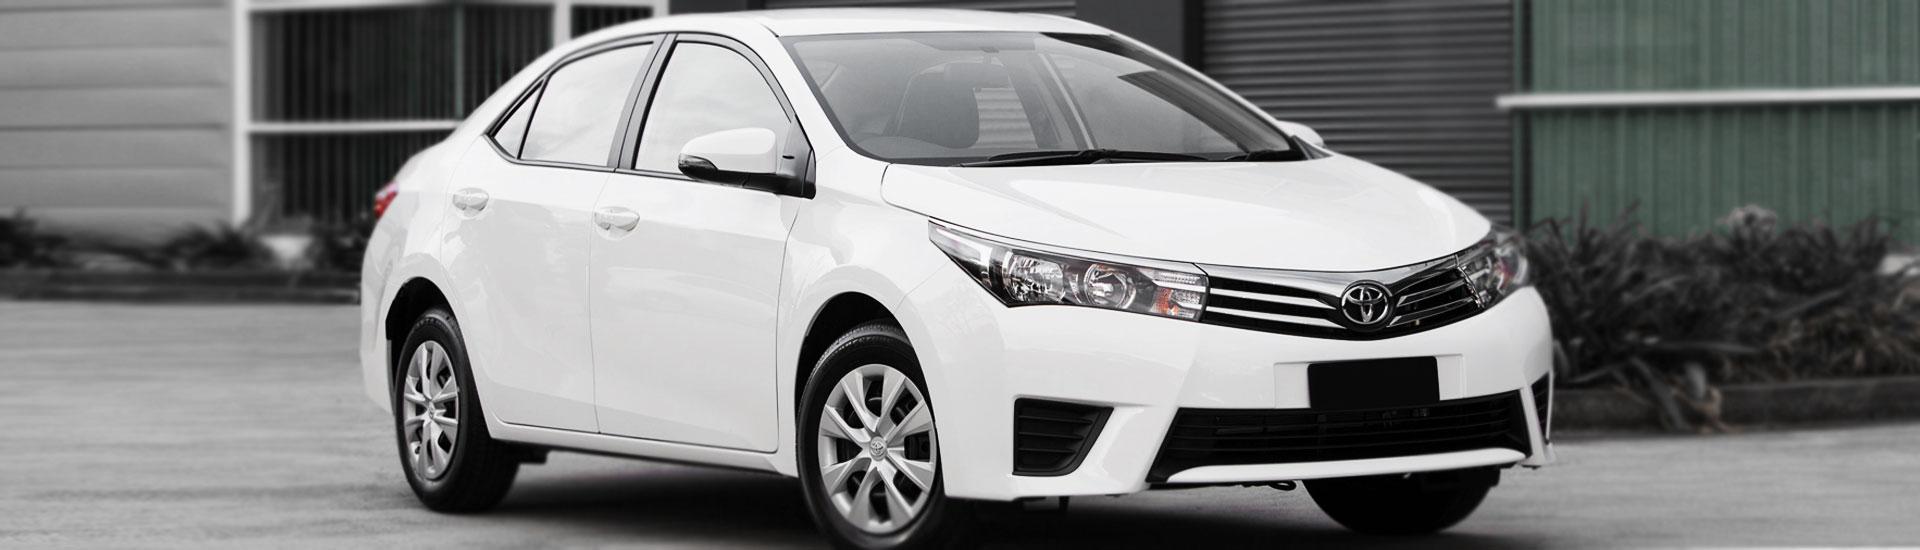 Toyota corolla window tint